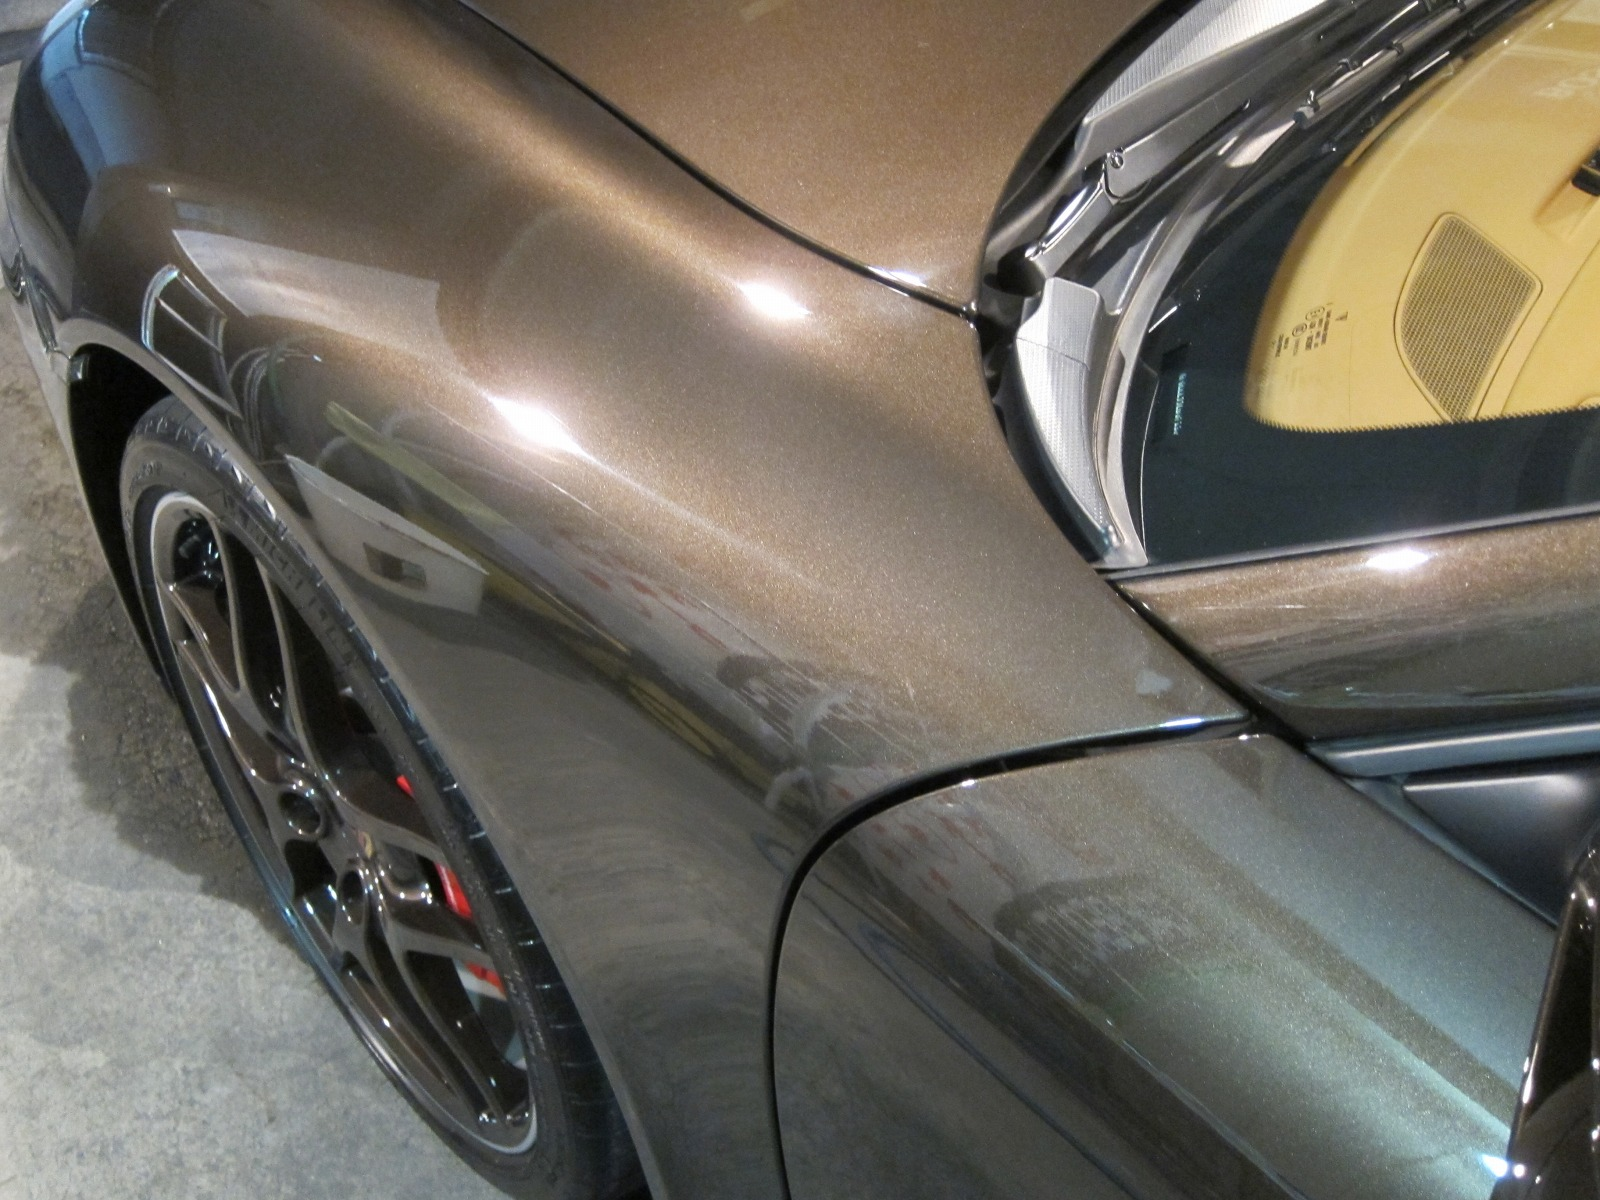 20150919-porsche-911-carrera-4s-13